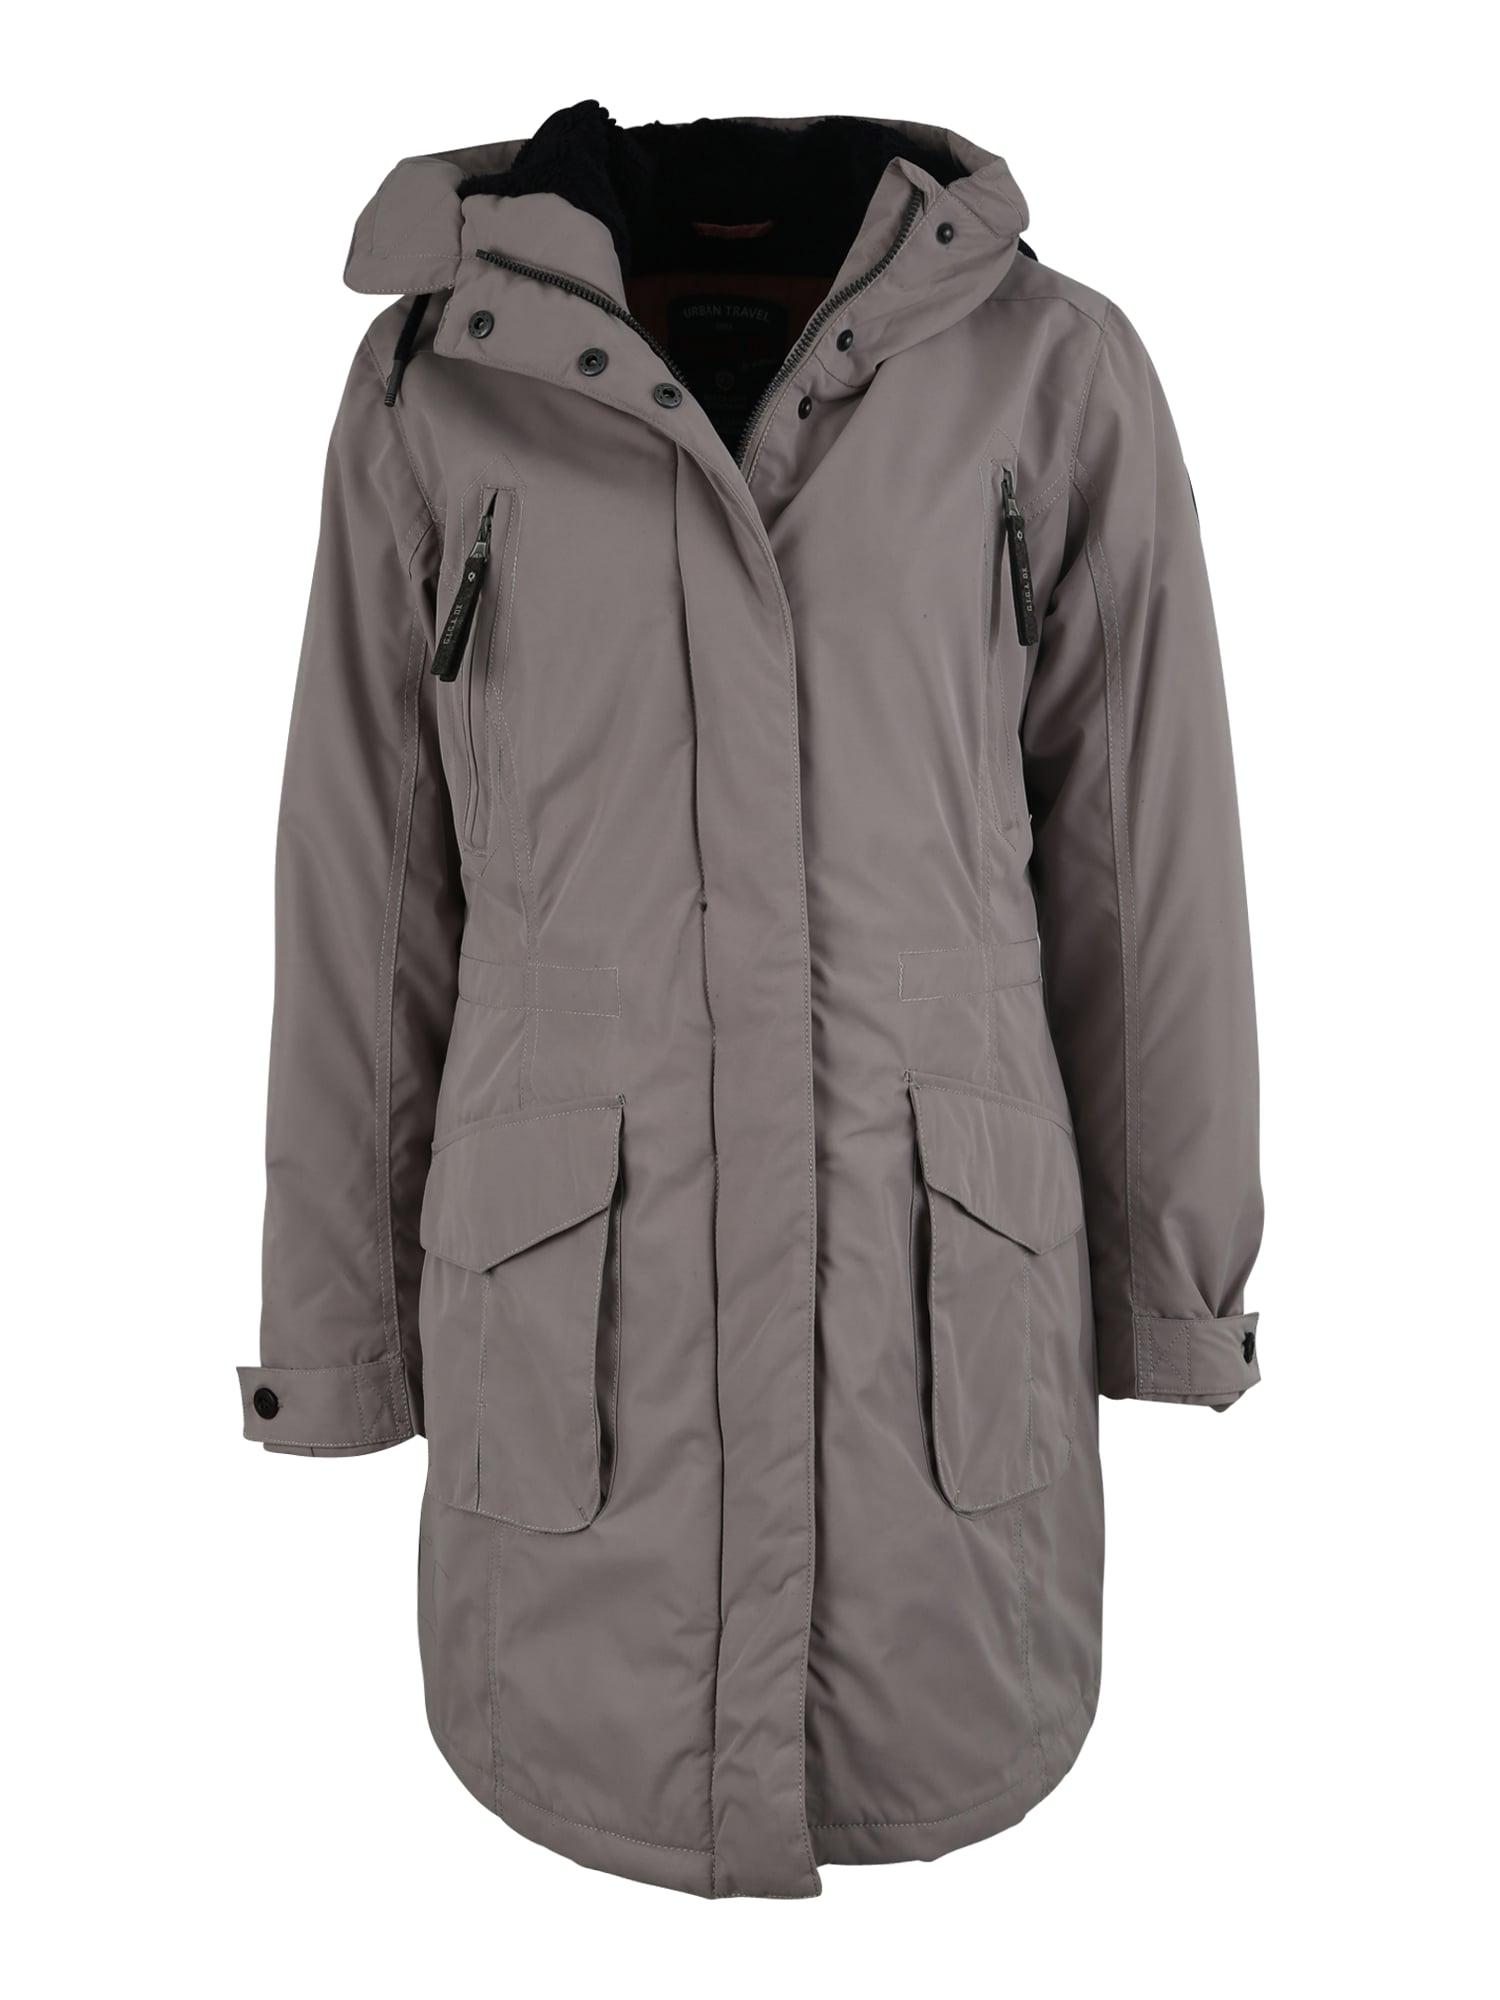 Outdoorový kabát Mawota šedobéžová G.I.G.A. DX